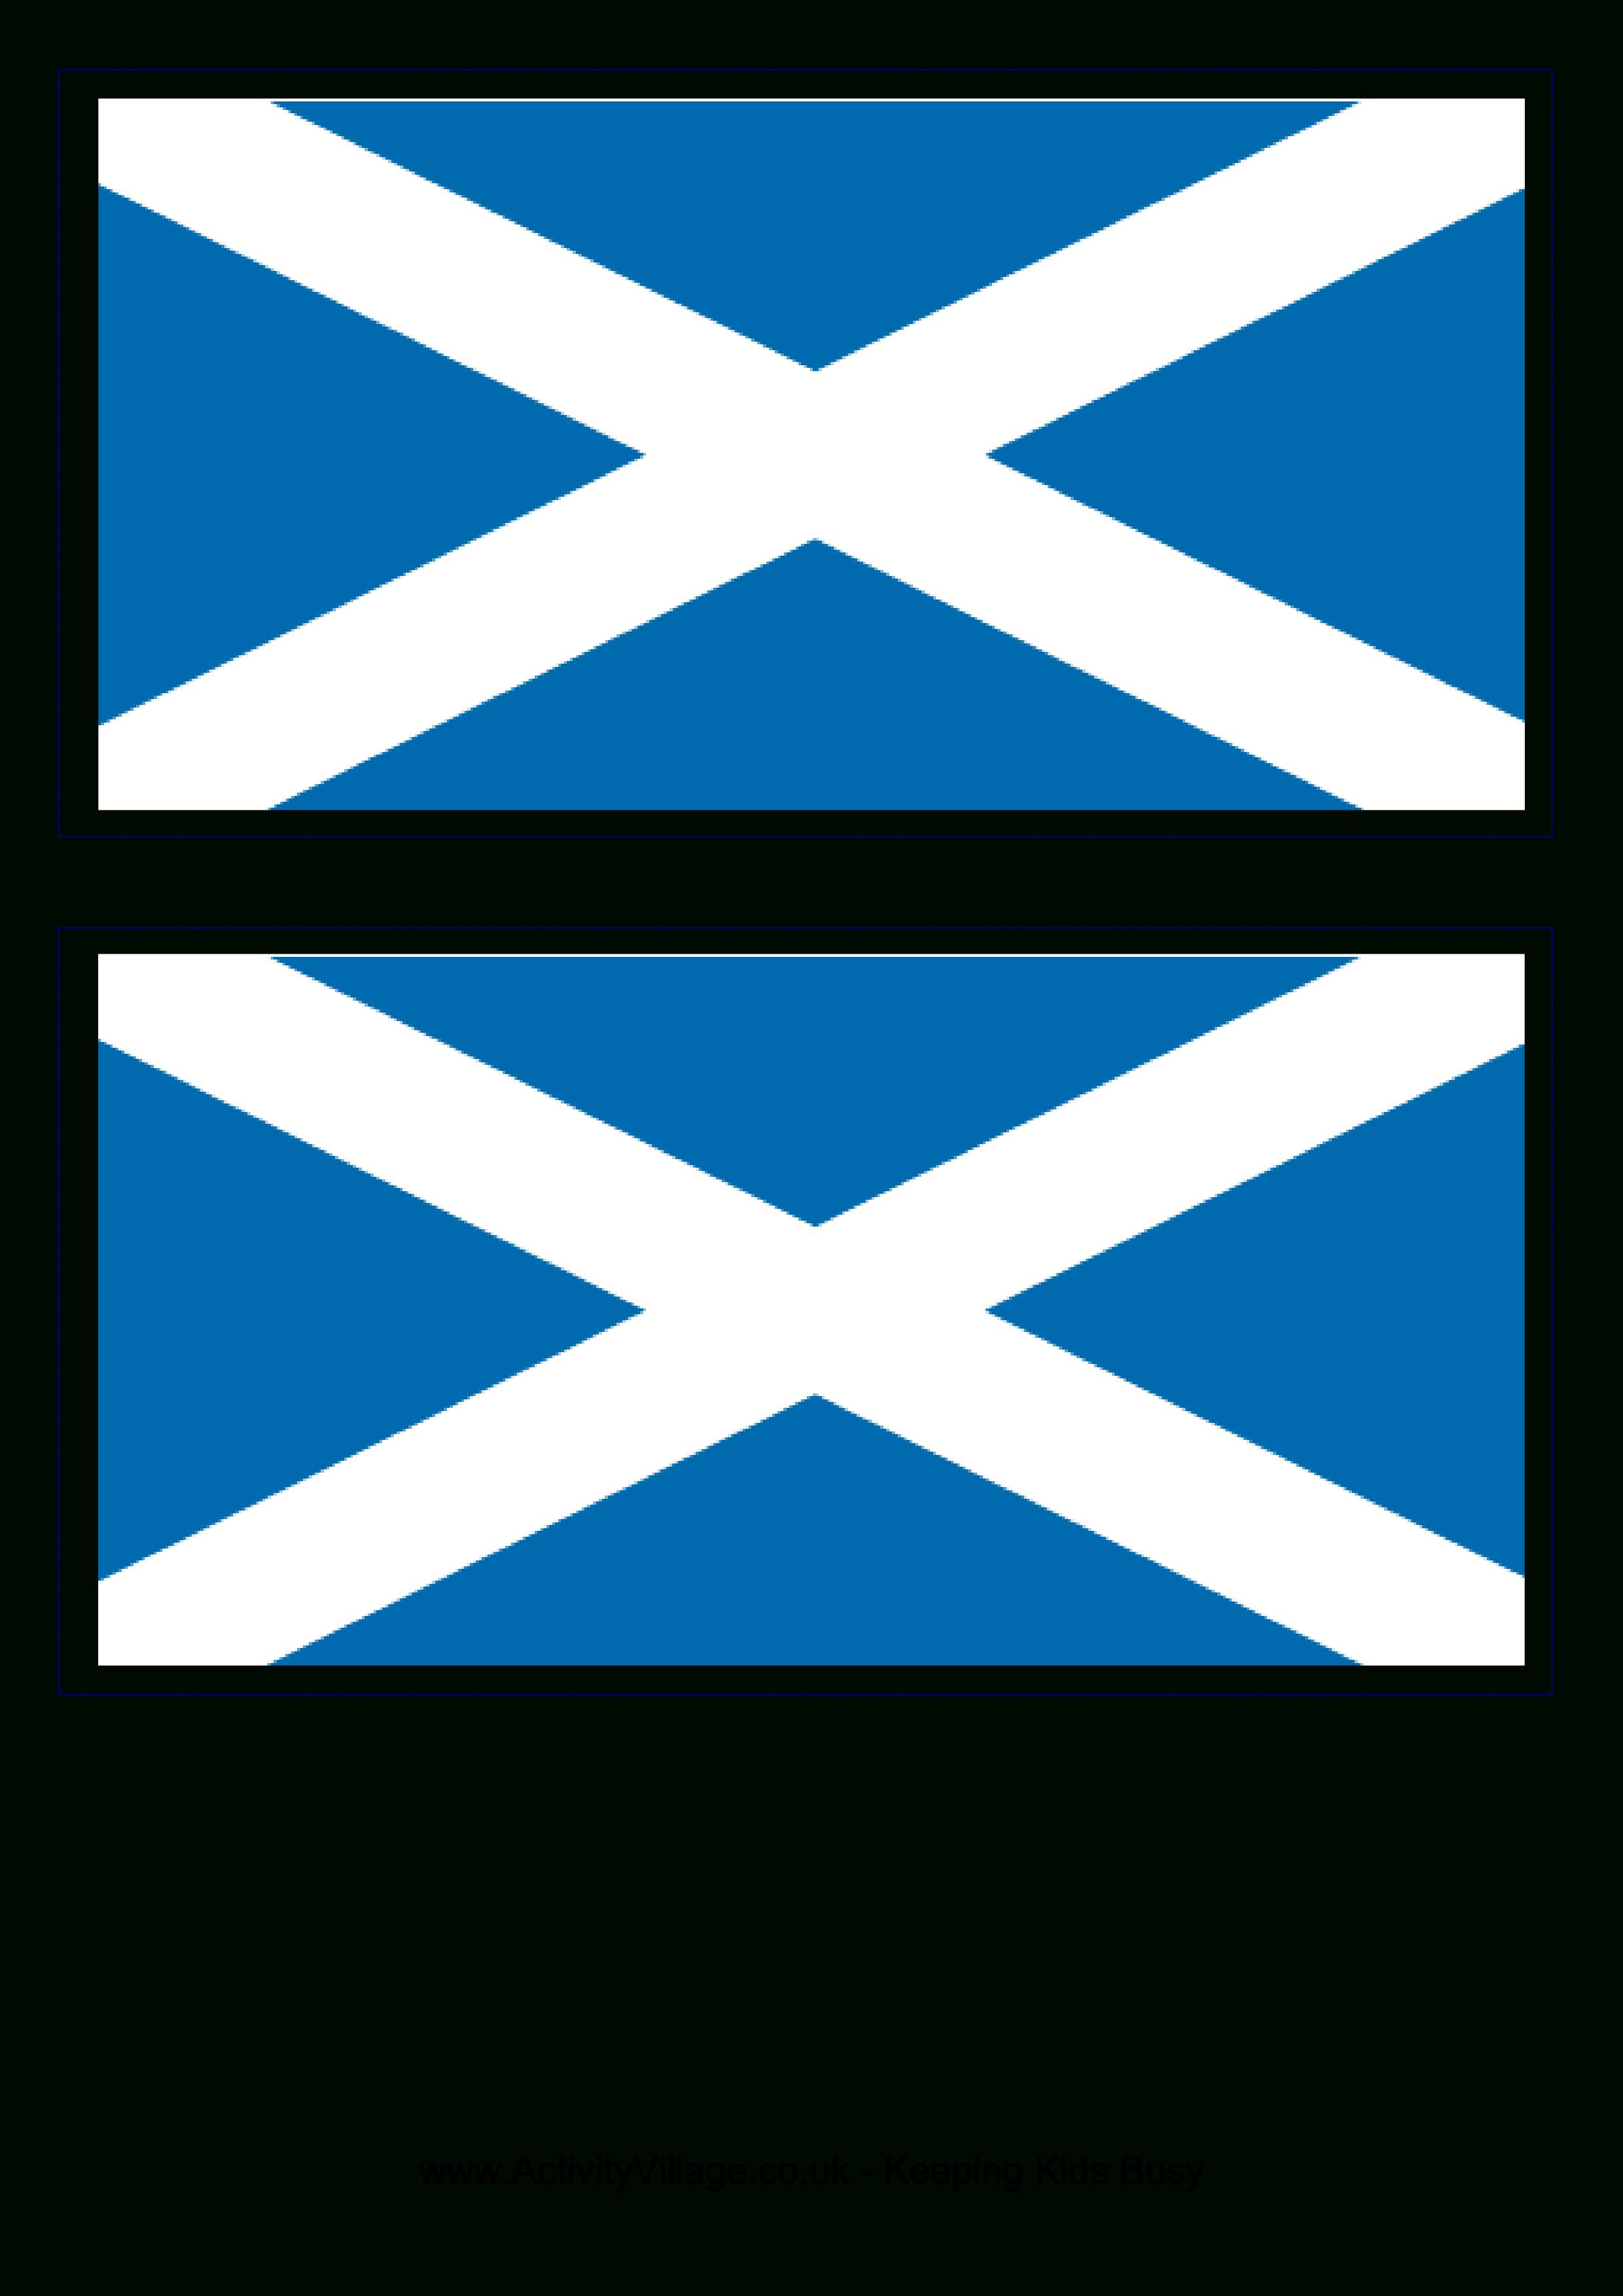 Scotland Flag - Download This Free Printable Scotland Template A4 - Free Printable Scottish Flag